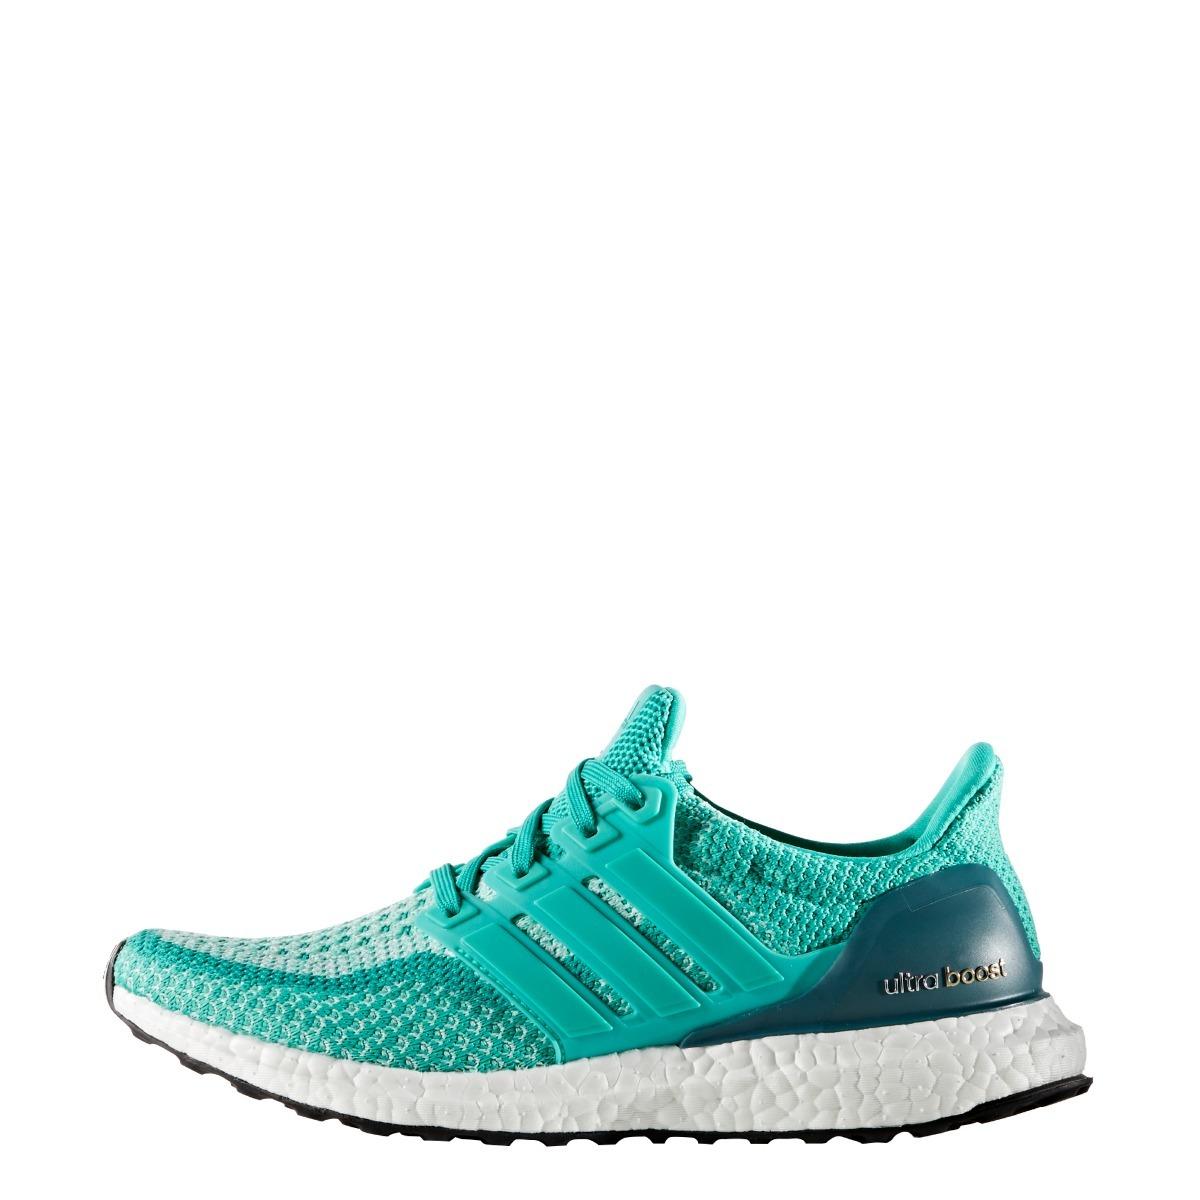 4dd73aa07dbda zapatillas running adidas ultraboost mujer v on sports. Cargando zoom.